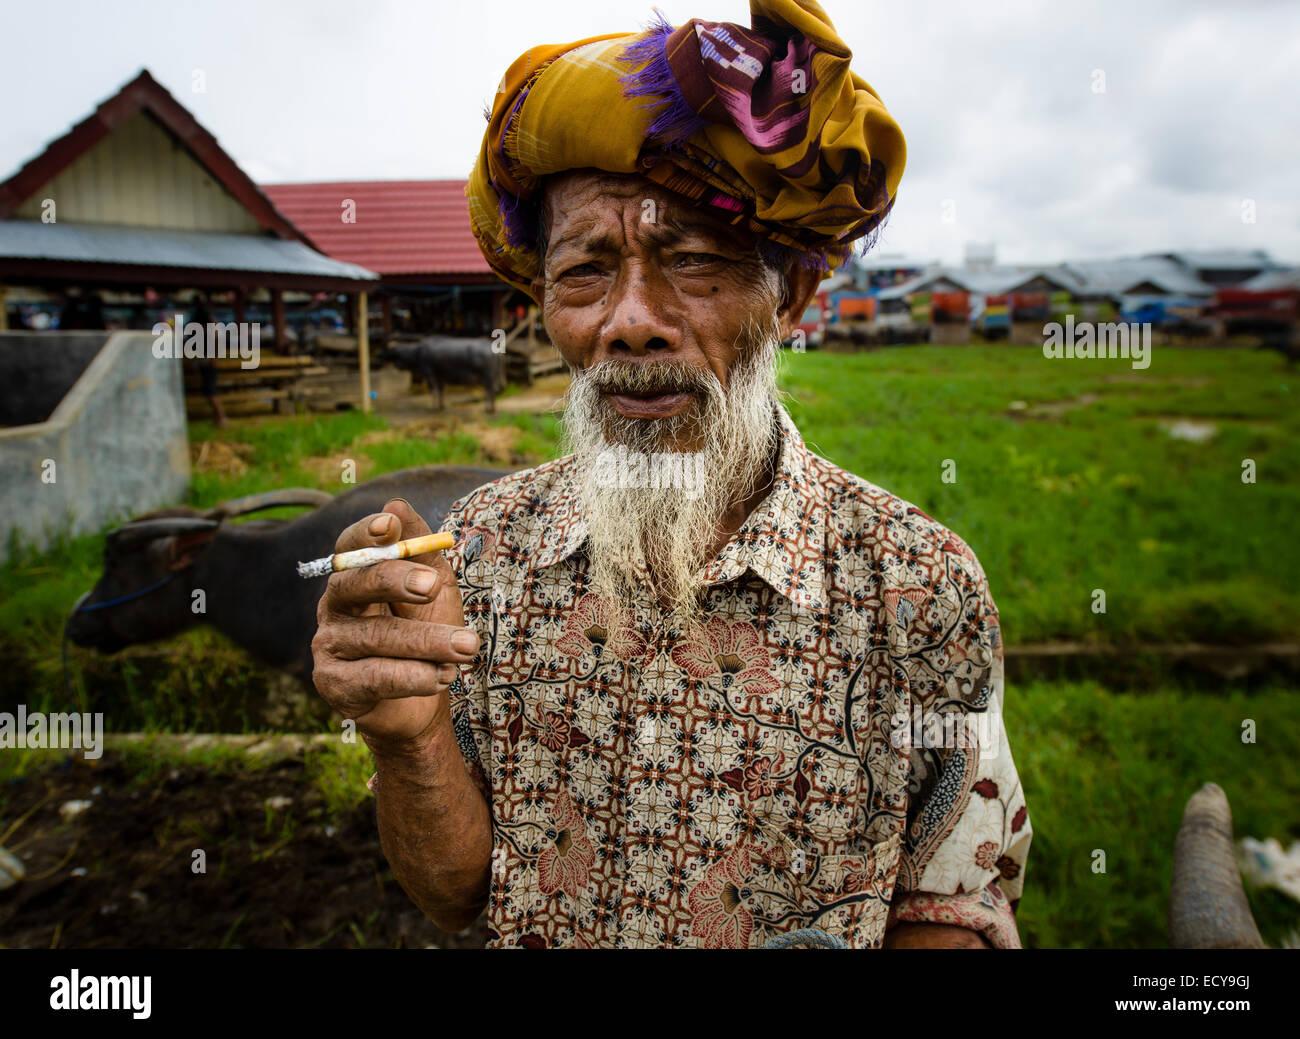 Toraja man at the livestock market, Sulawesi, Indonesia - Stock Image